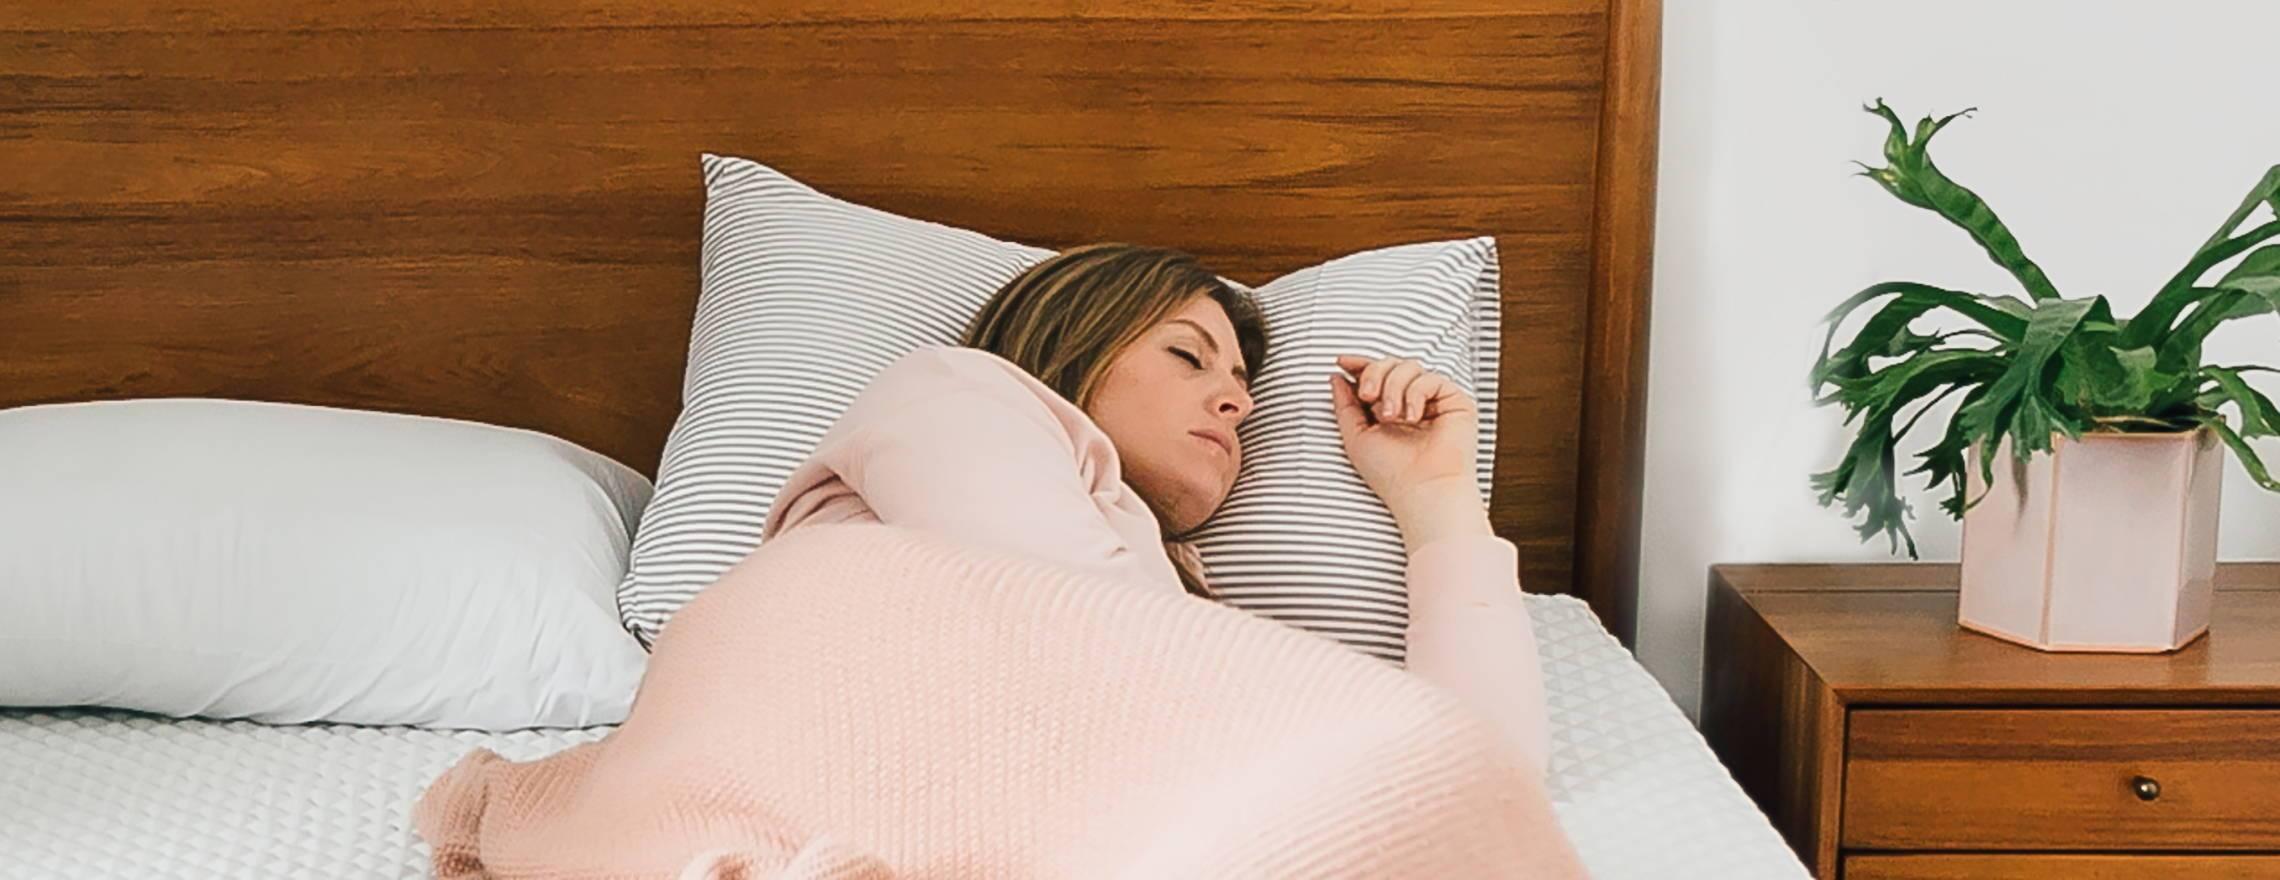 lady_resting_on_a_leesa_mattress_and_a_leesa_pillow